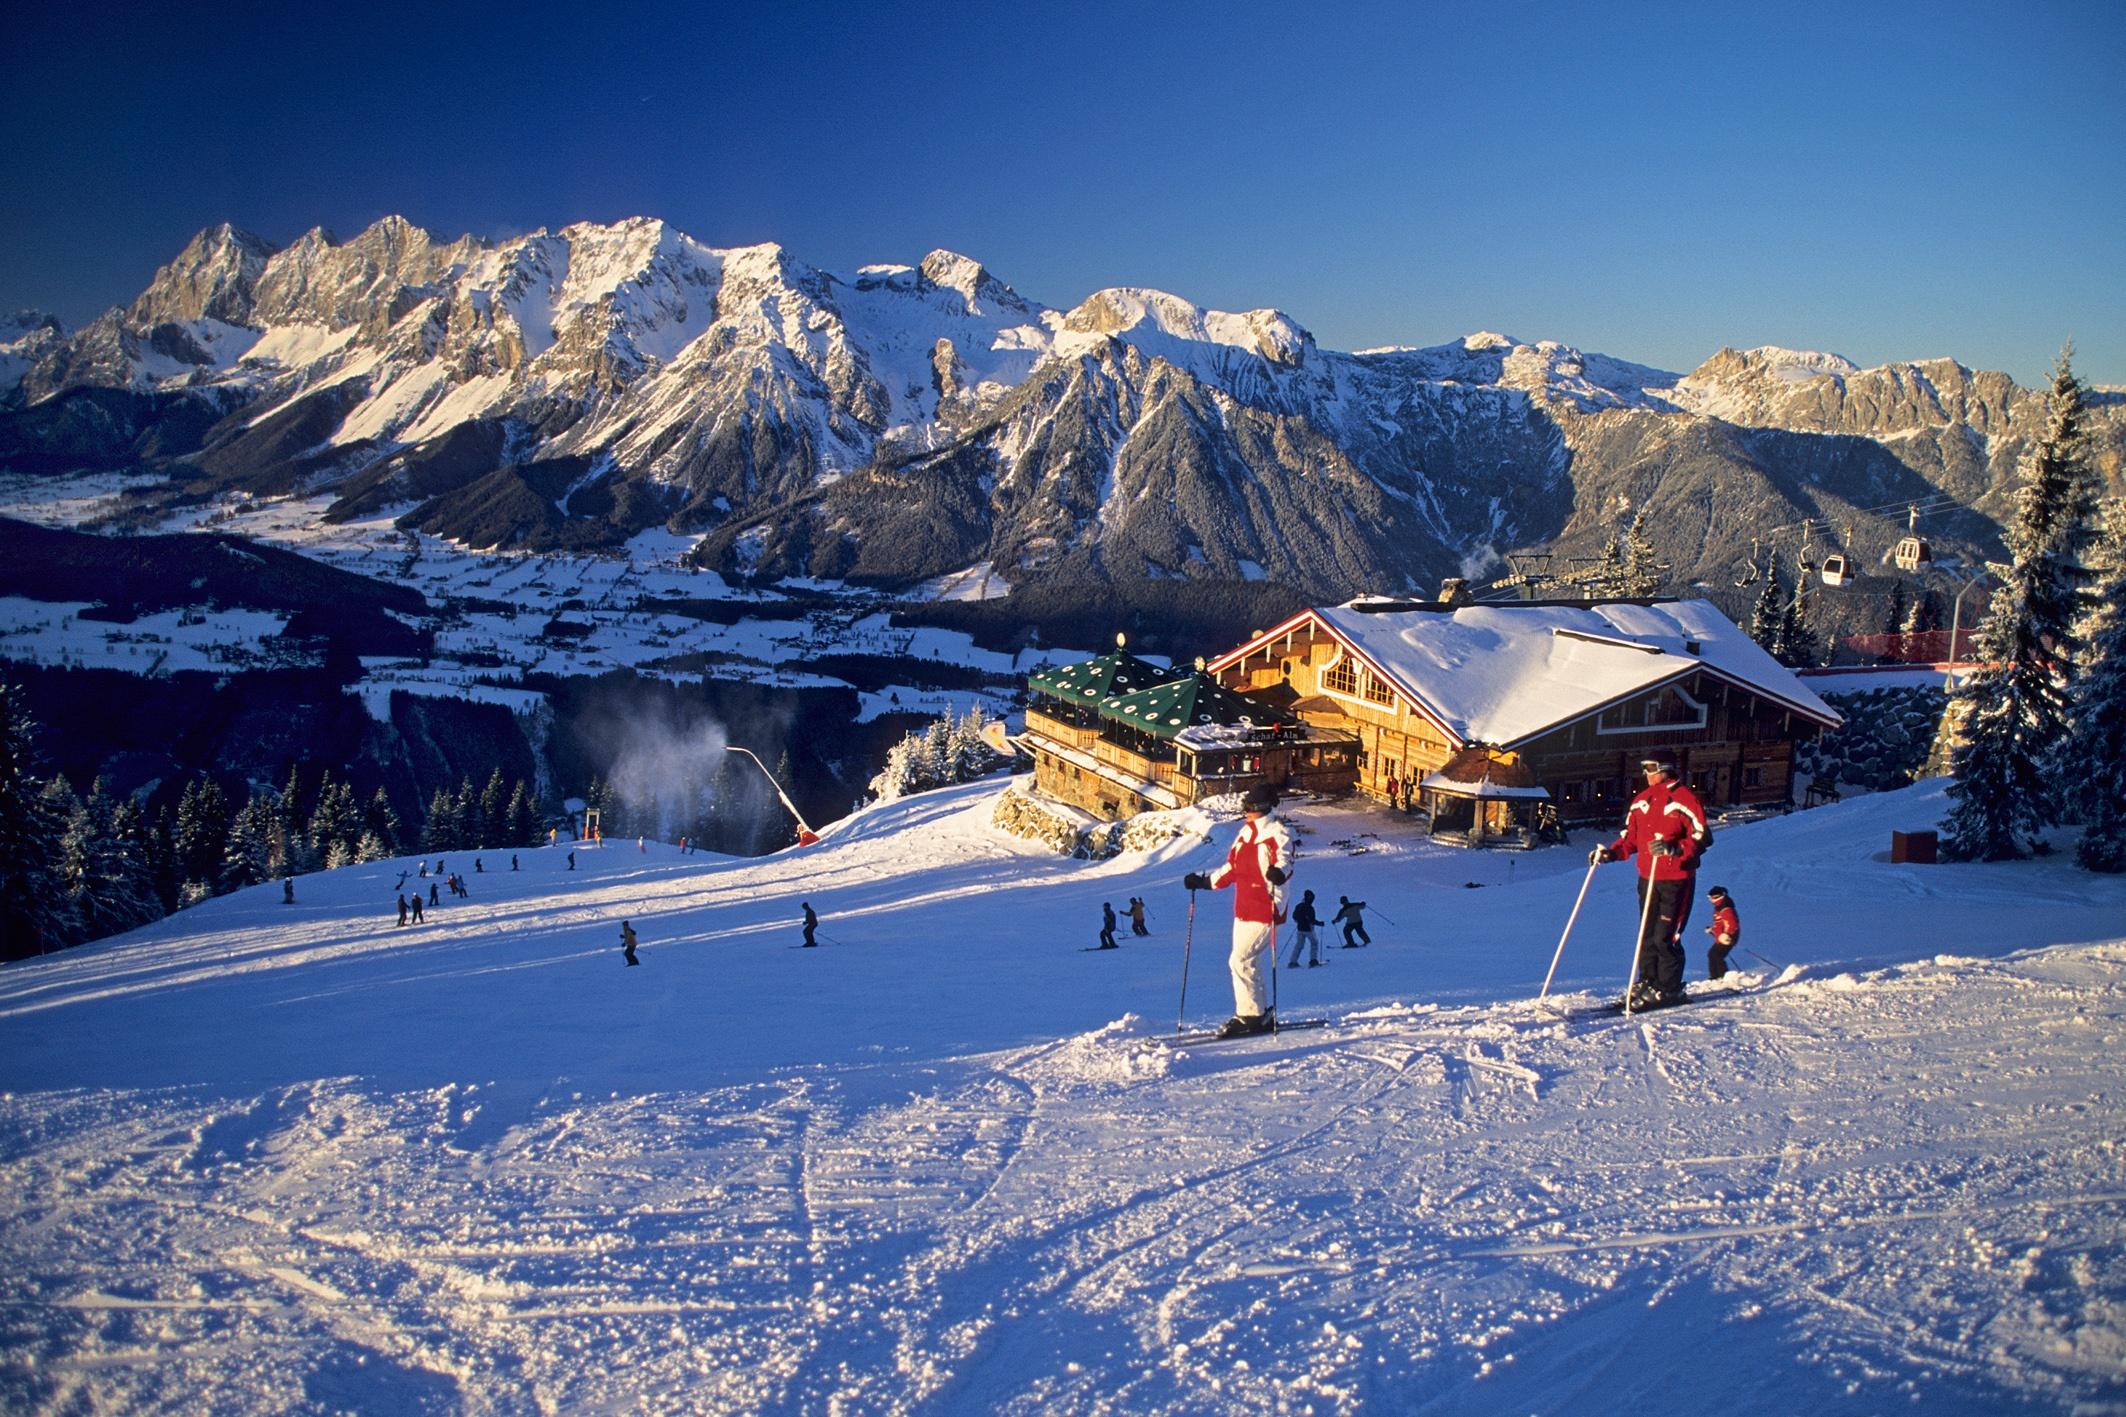 Открытка, картинки горнолыжные курорты австрии